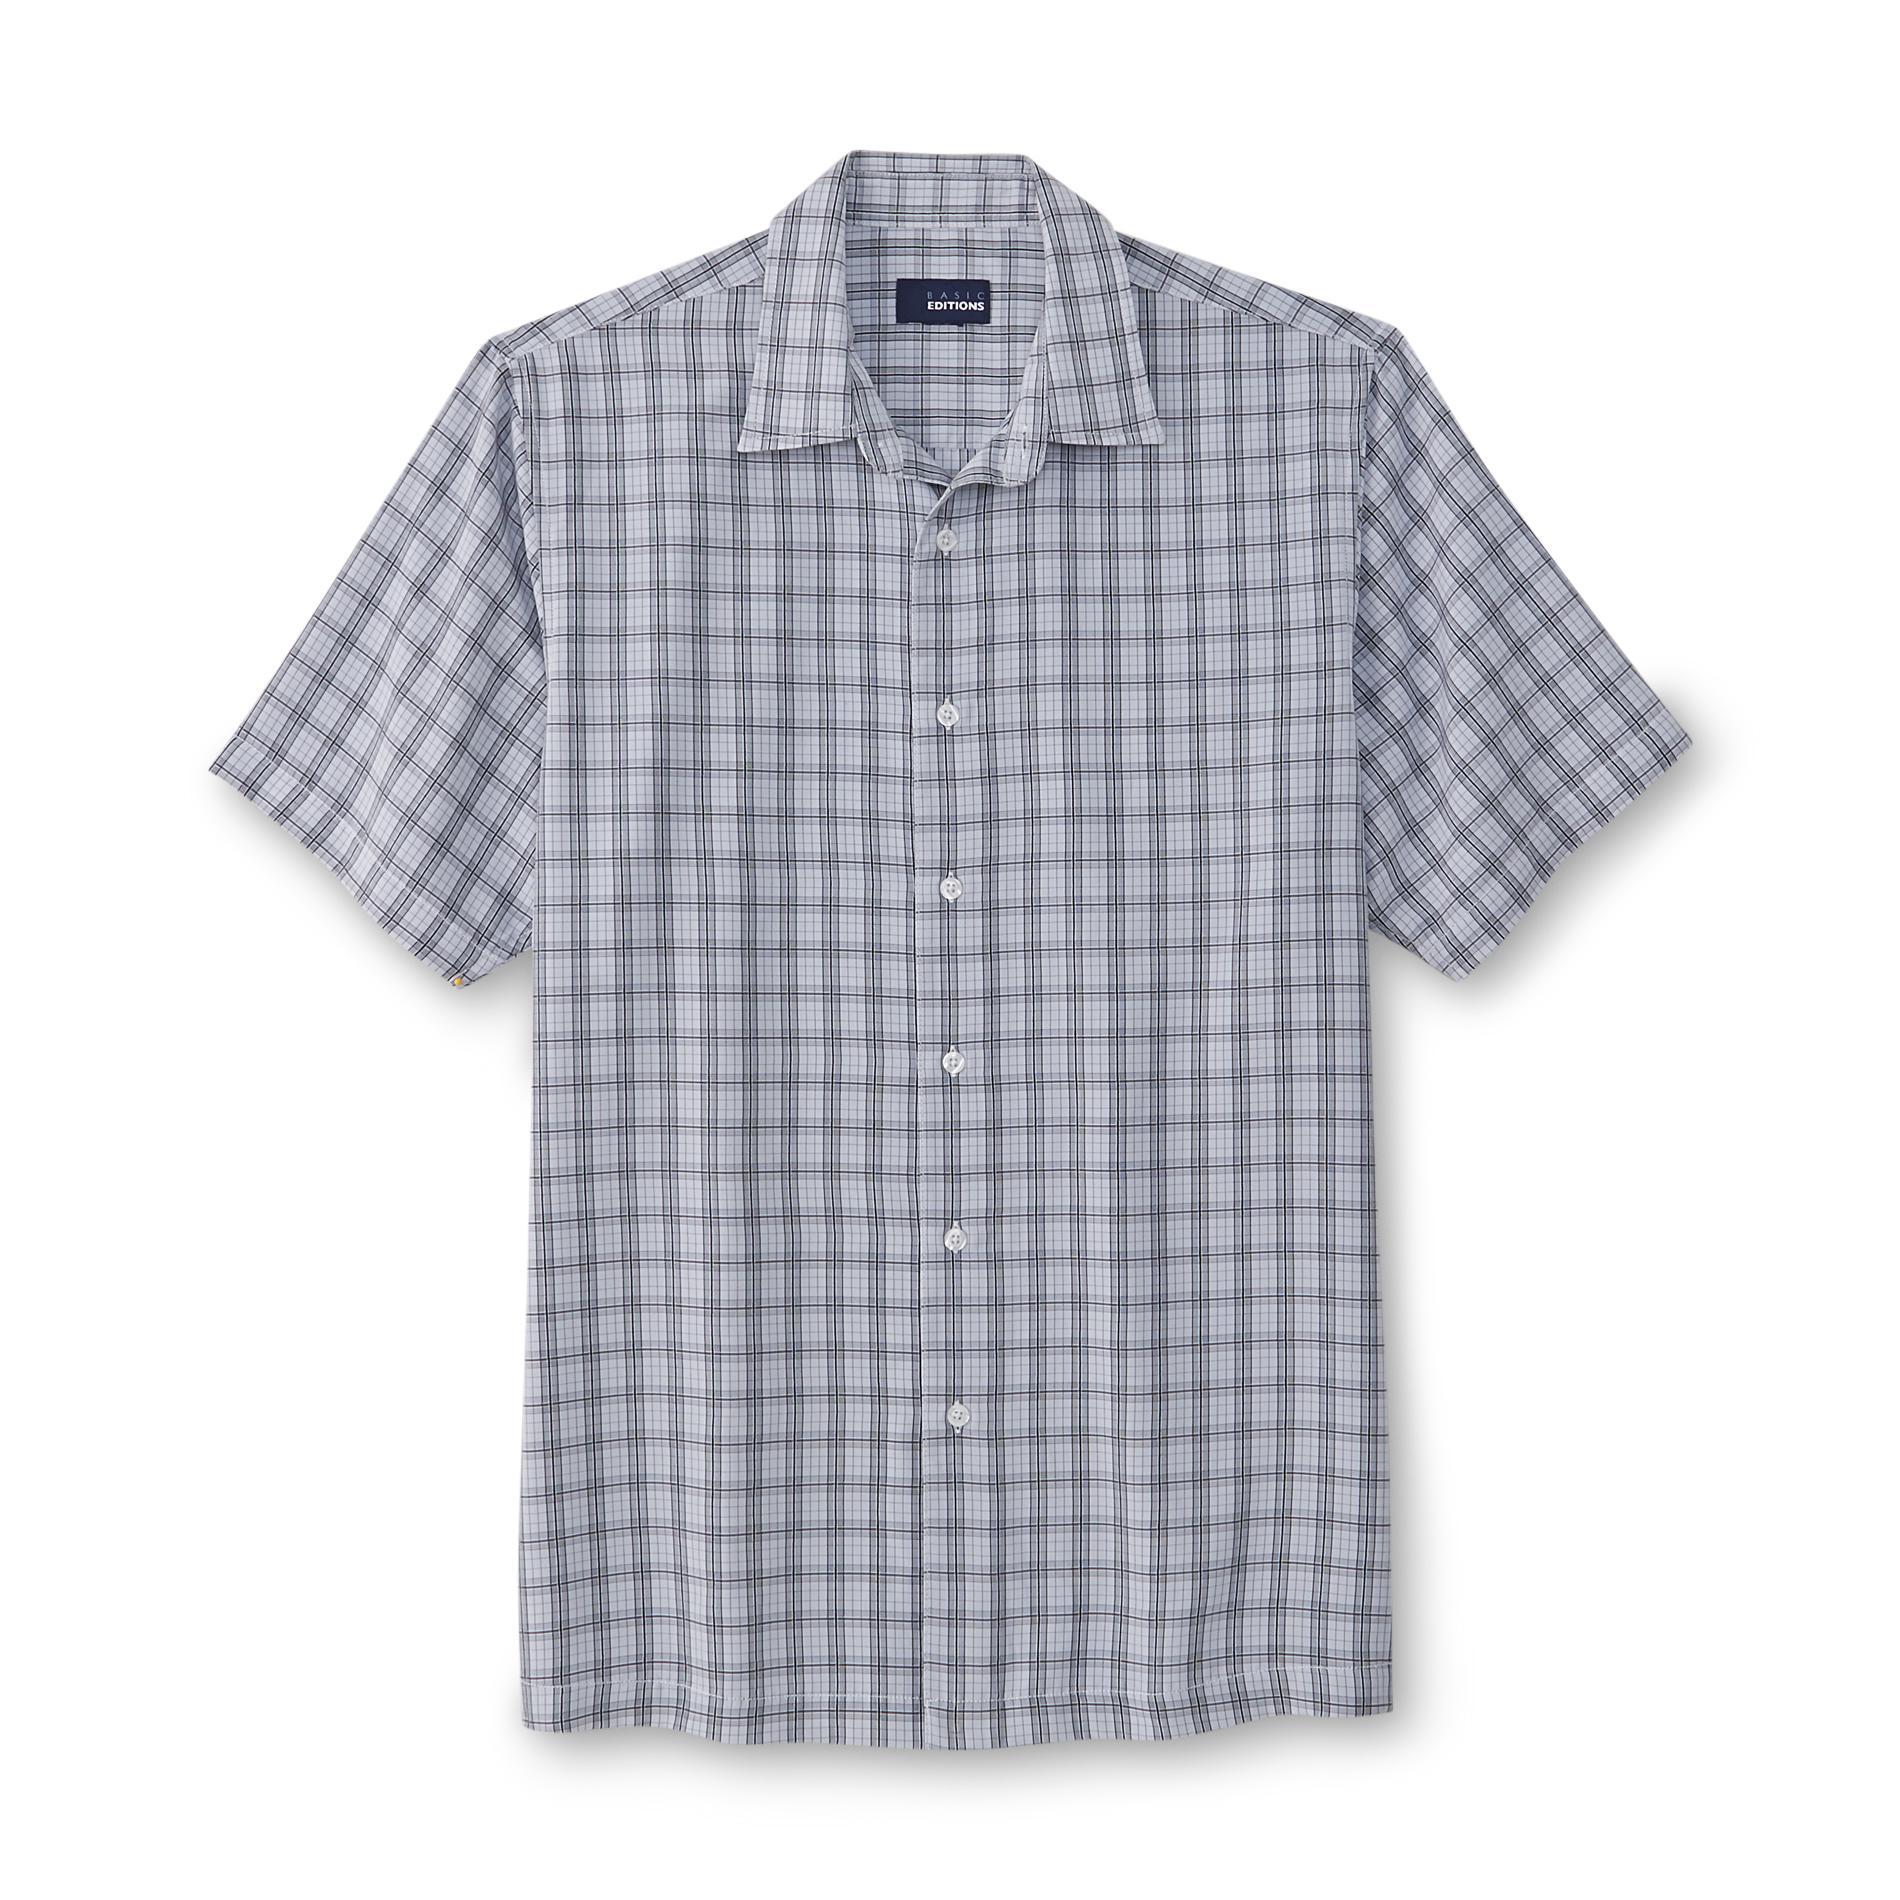 Basic Editions Men's Short-Sleeve Microfiber Shirt - Plaid